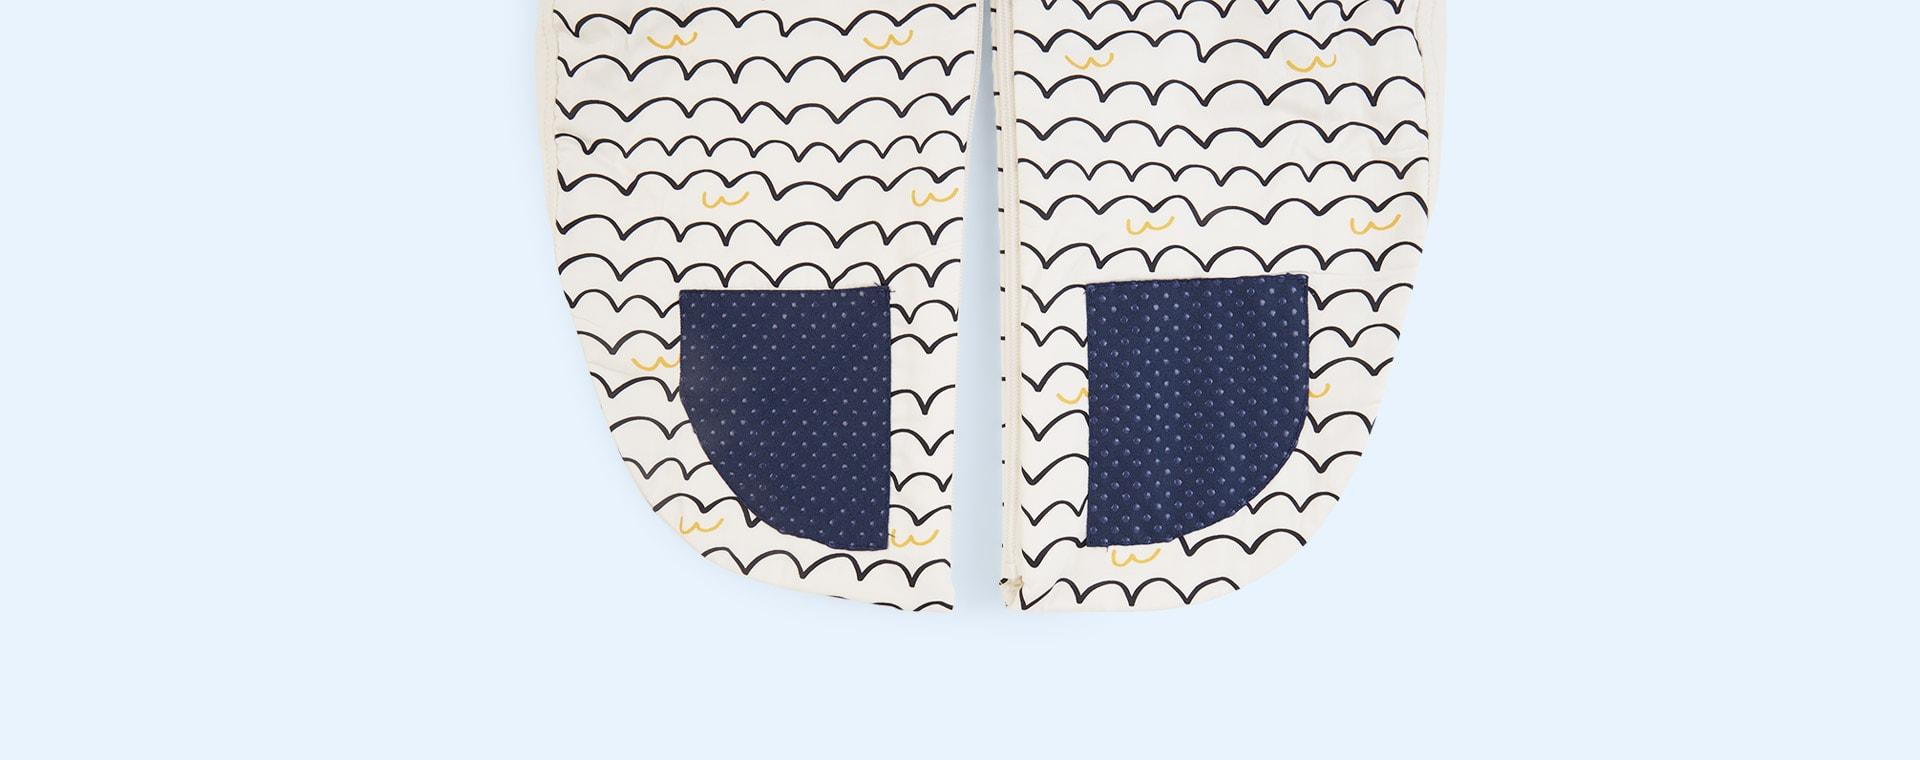 Waves Ergopouch Sleepsuit Bag - 1 Tog